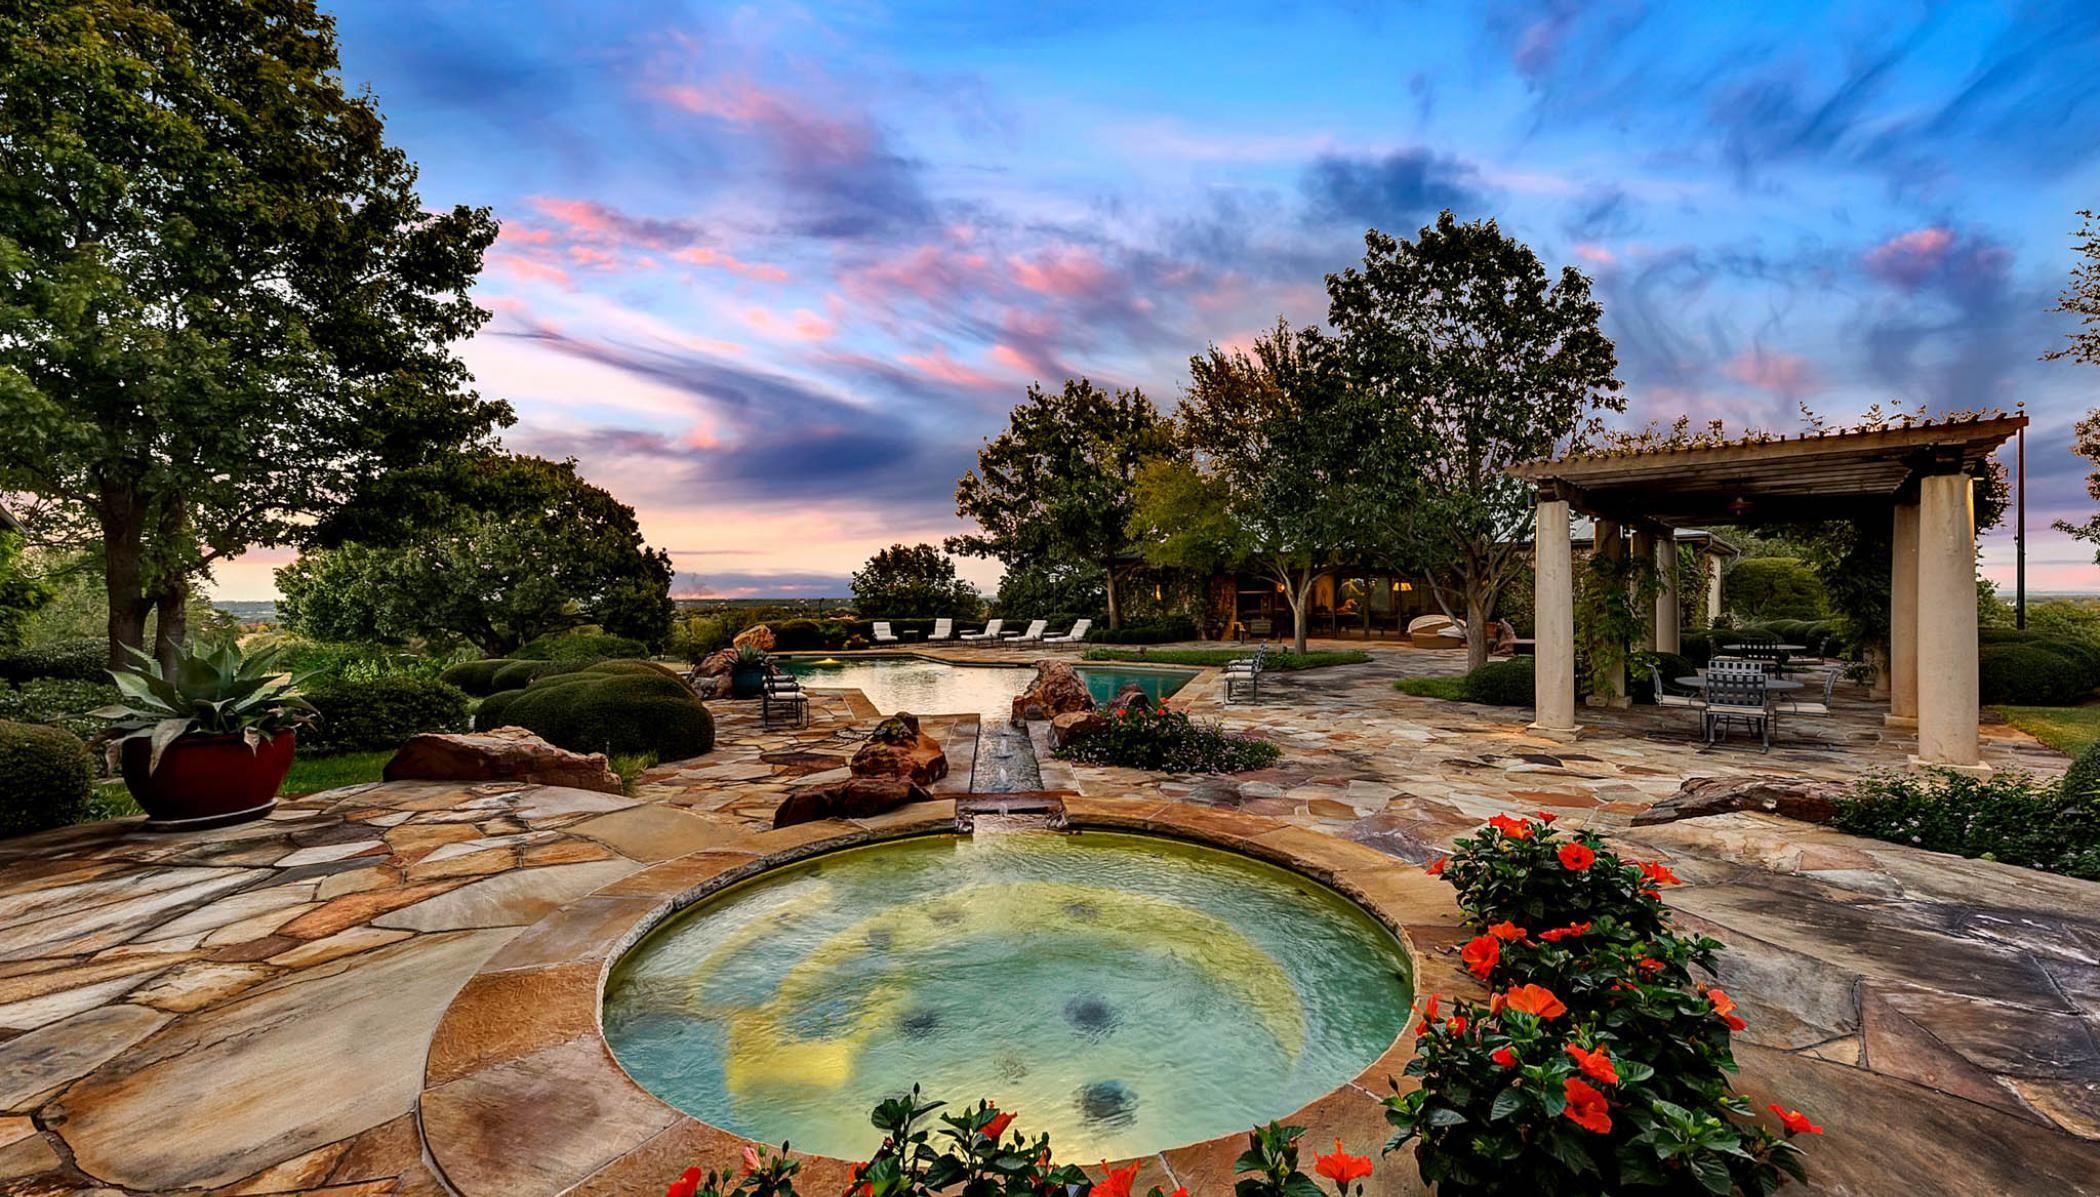 Luxury Ranch Pool Near Aledo Texas Luxury ranch, Ranch